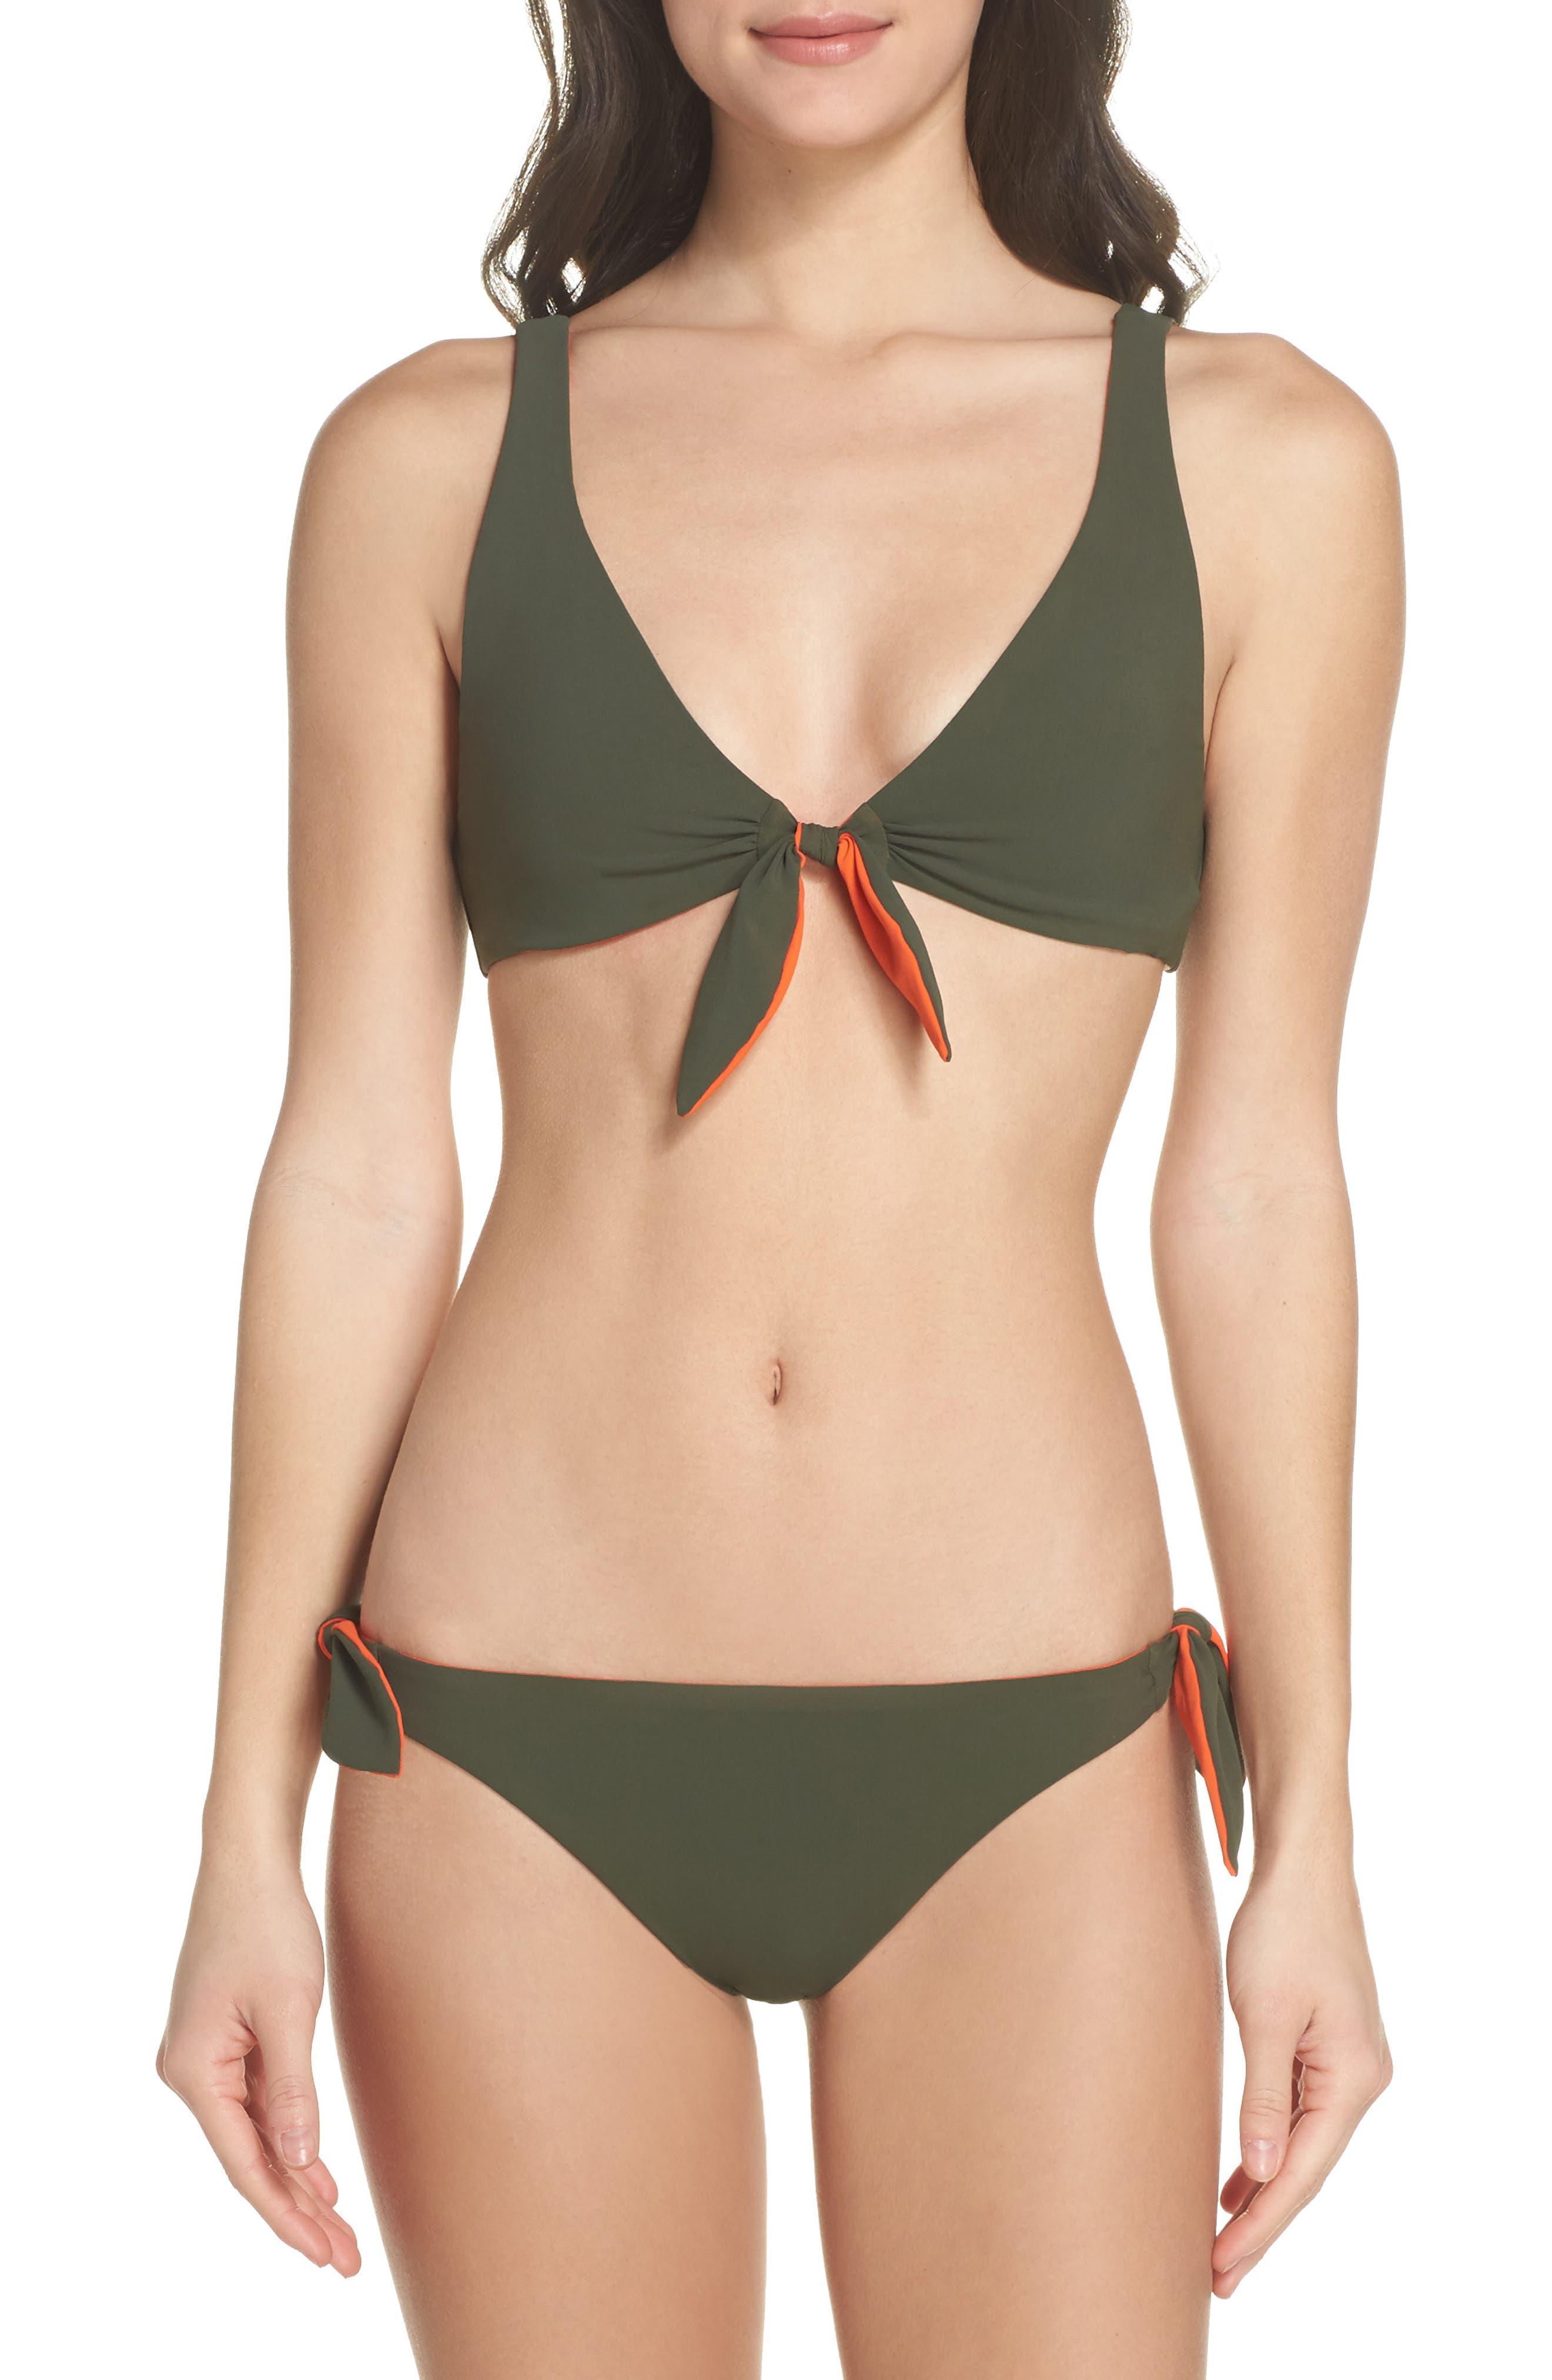 Biarritz Reversible Bikini Bottoms,                             Alternate thumbnail 6, color,                             Green Olive/ Sweet Tangerine